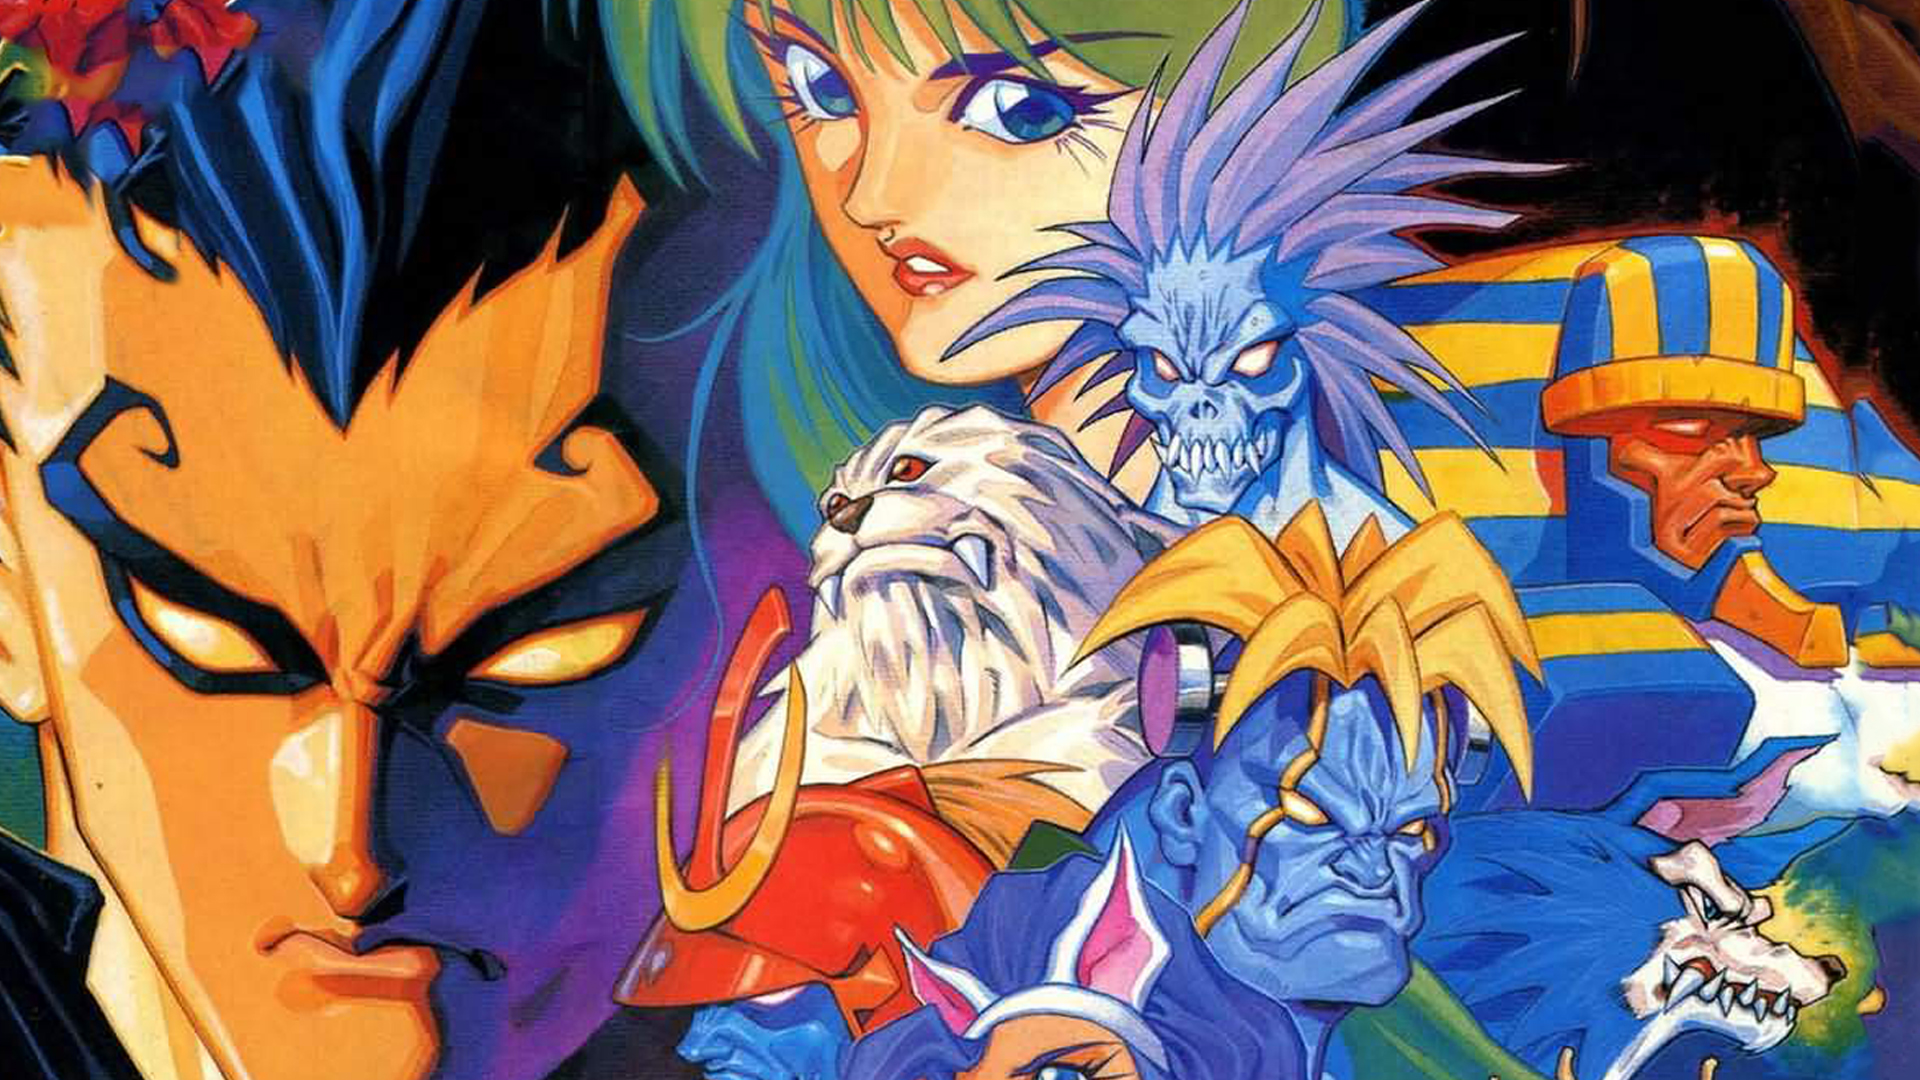 Night Warriors: Darkstalkers' Revenge Details - LaunchBox Games Database